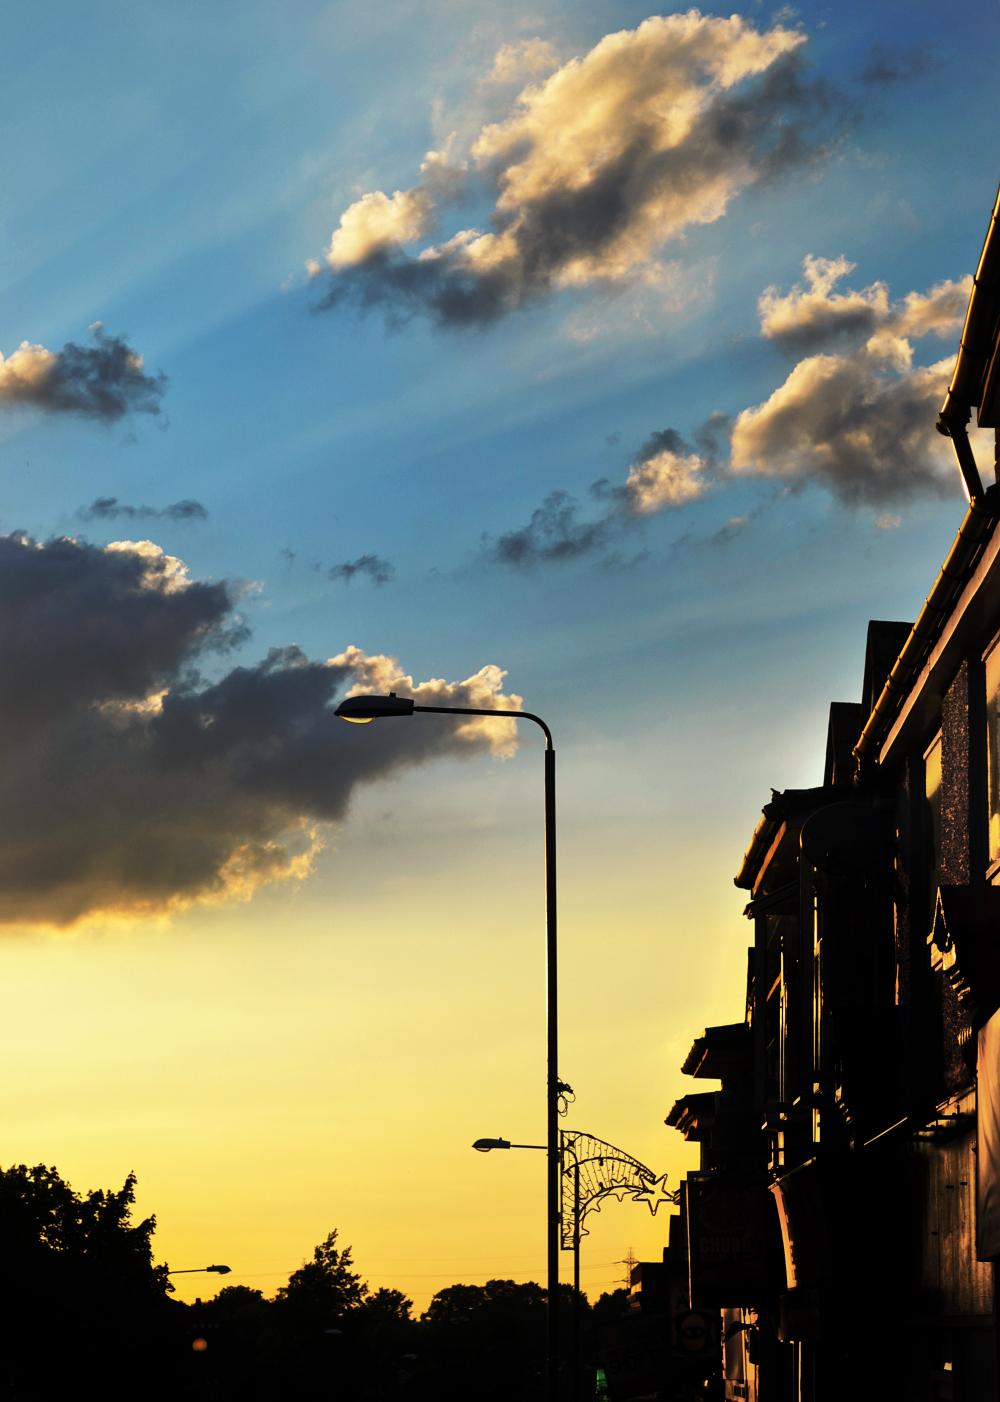 worcester-park england sunset street lamp